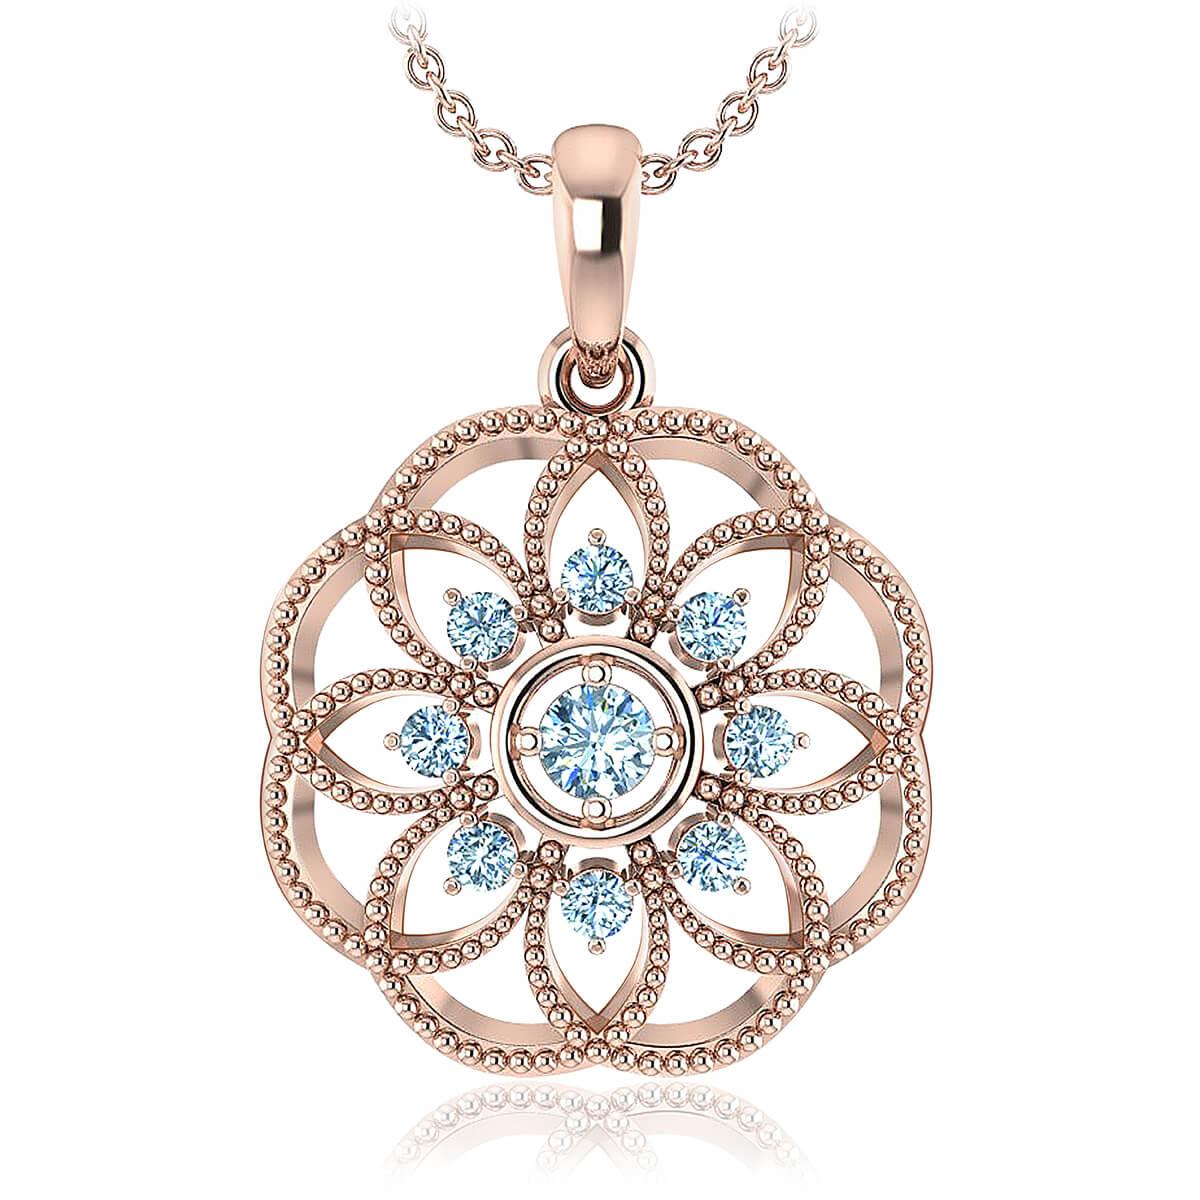 Marseilles Diamond Necklace (1/5 CT. TW.)